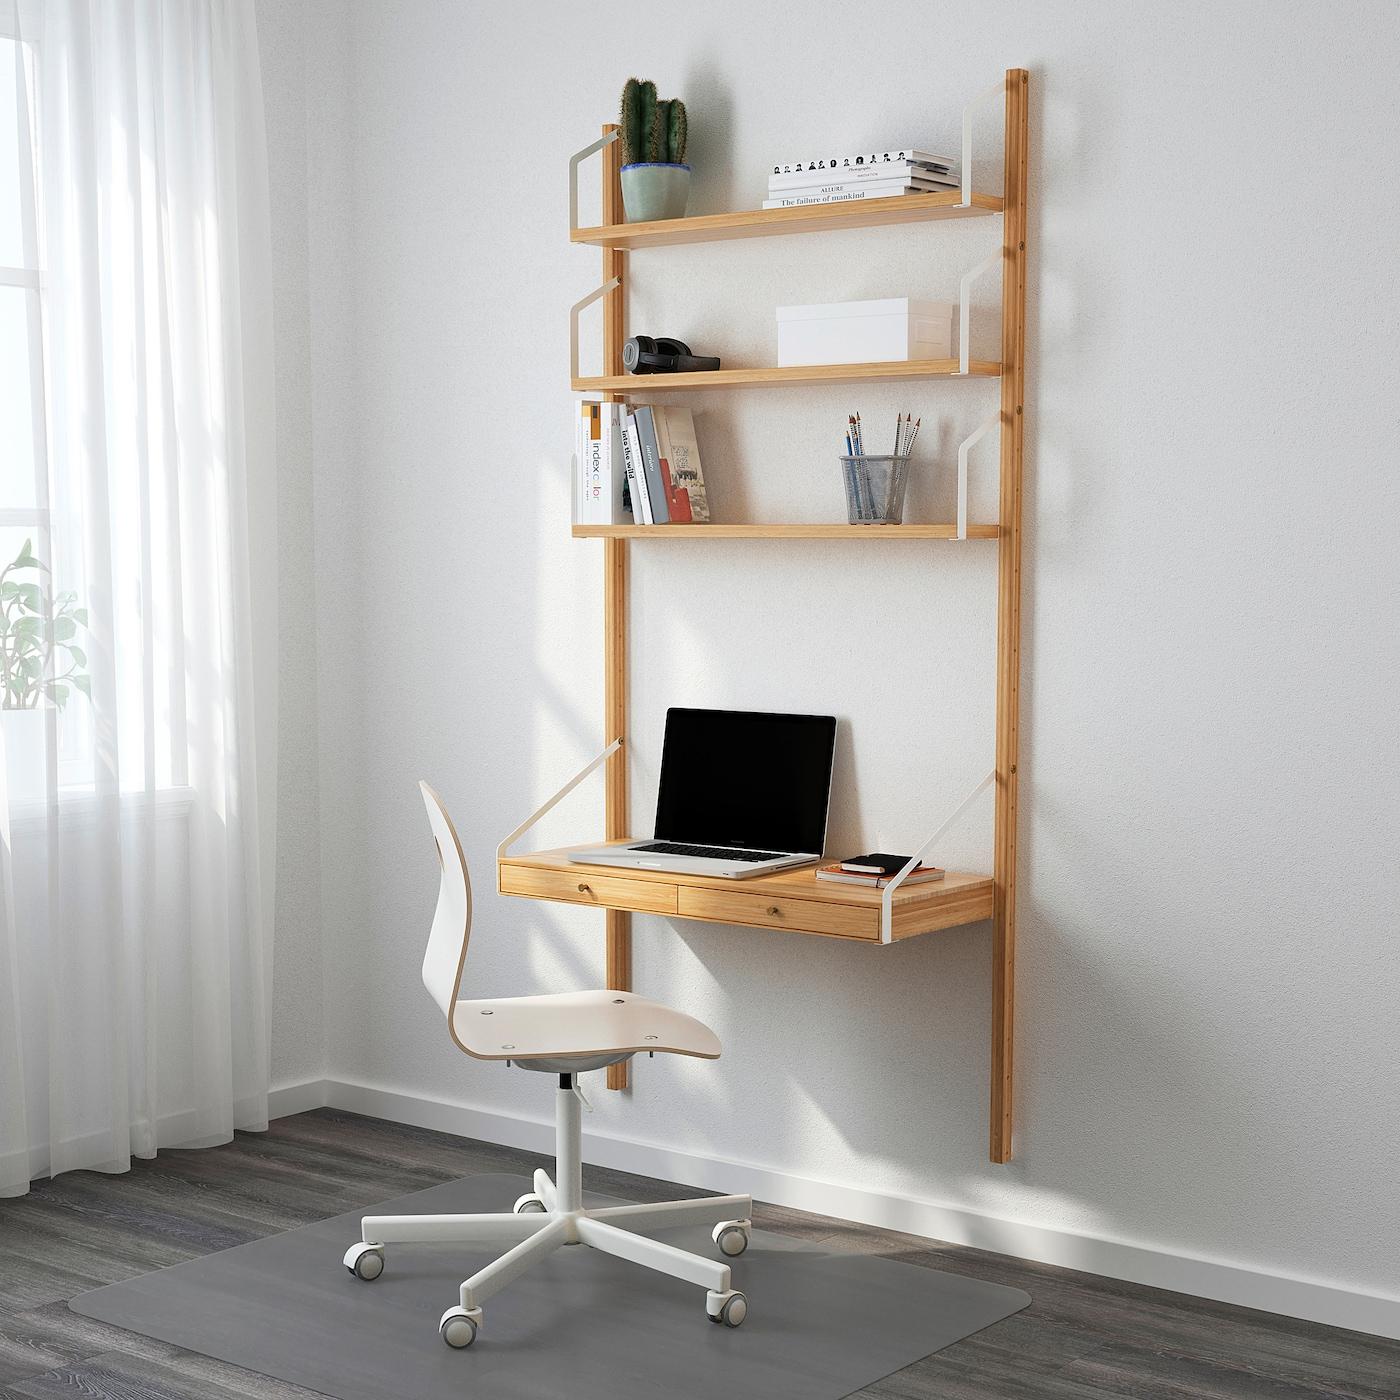 Svalnas Wall Mounted Storage Combination Bamboo 33 7 8x13 3 4x69 1 4 Ikea